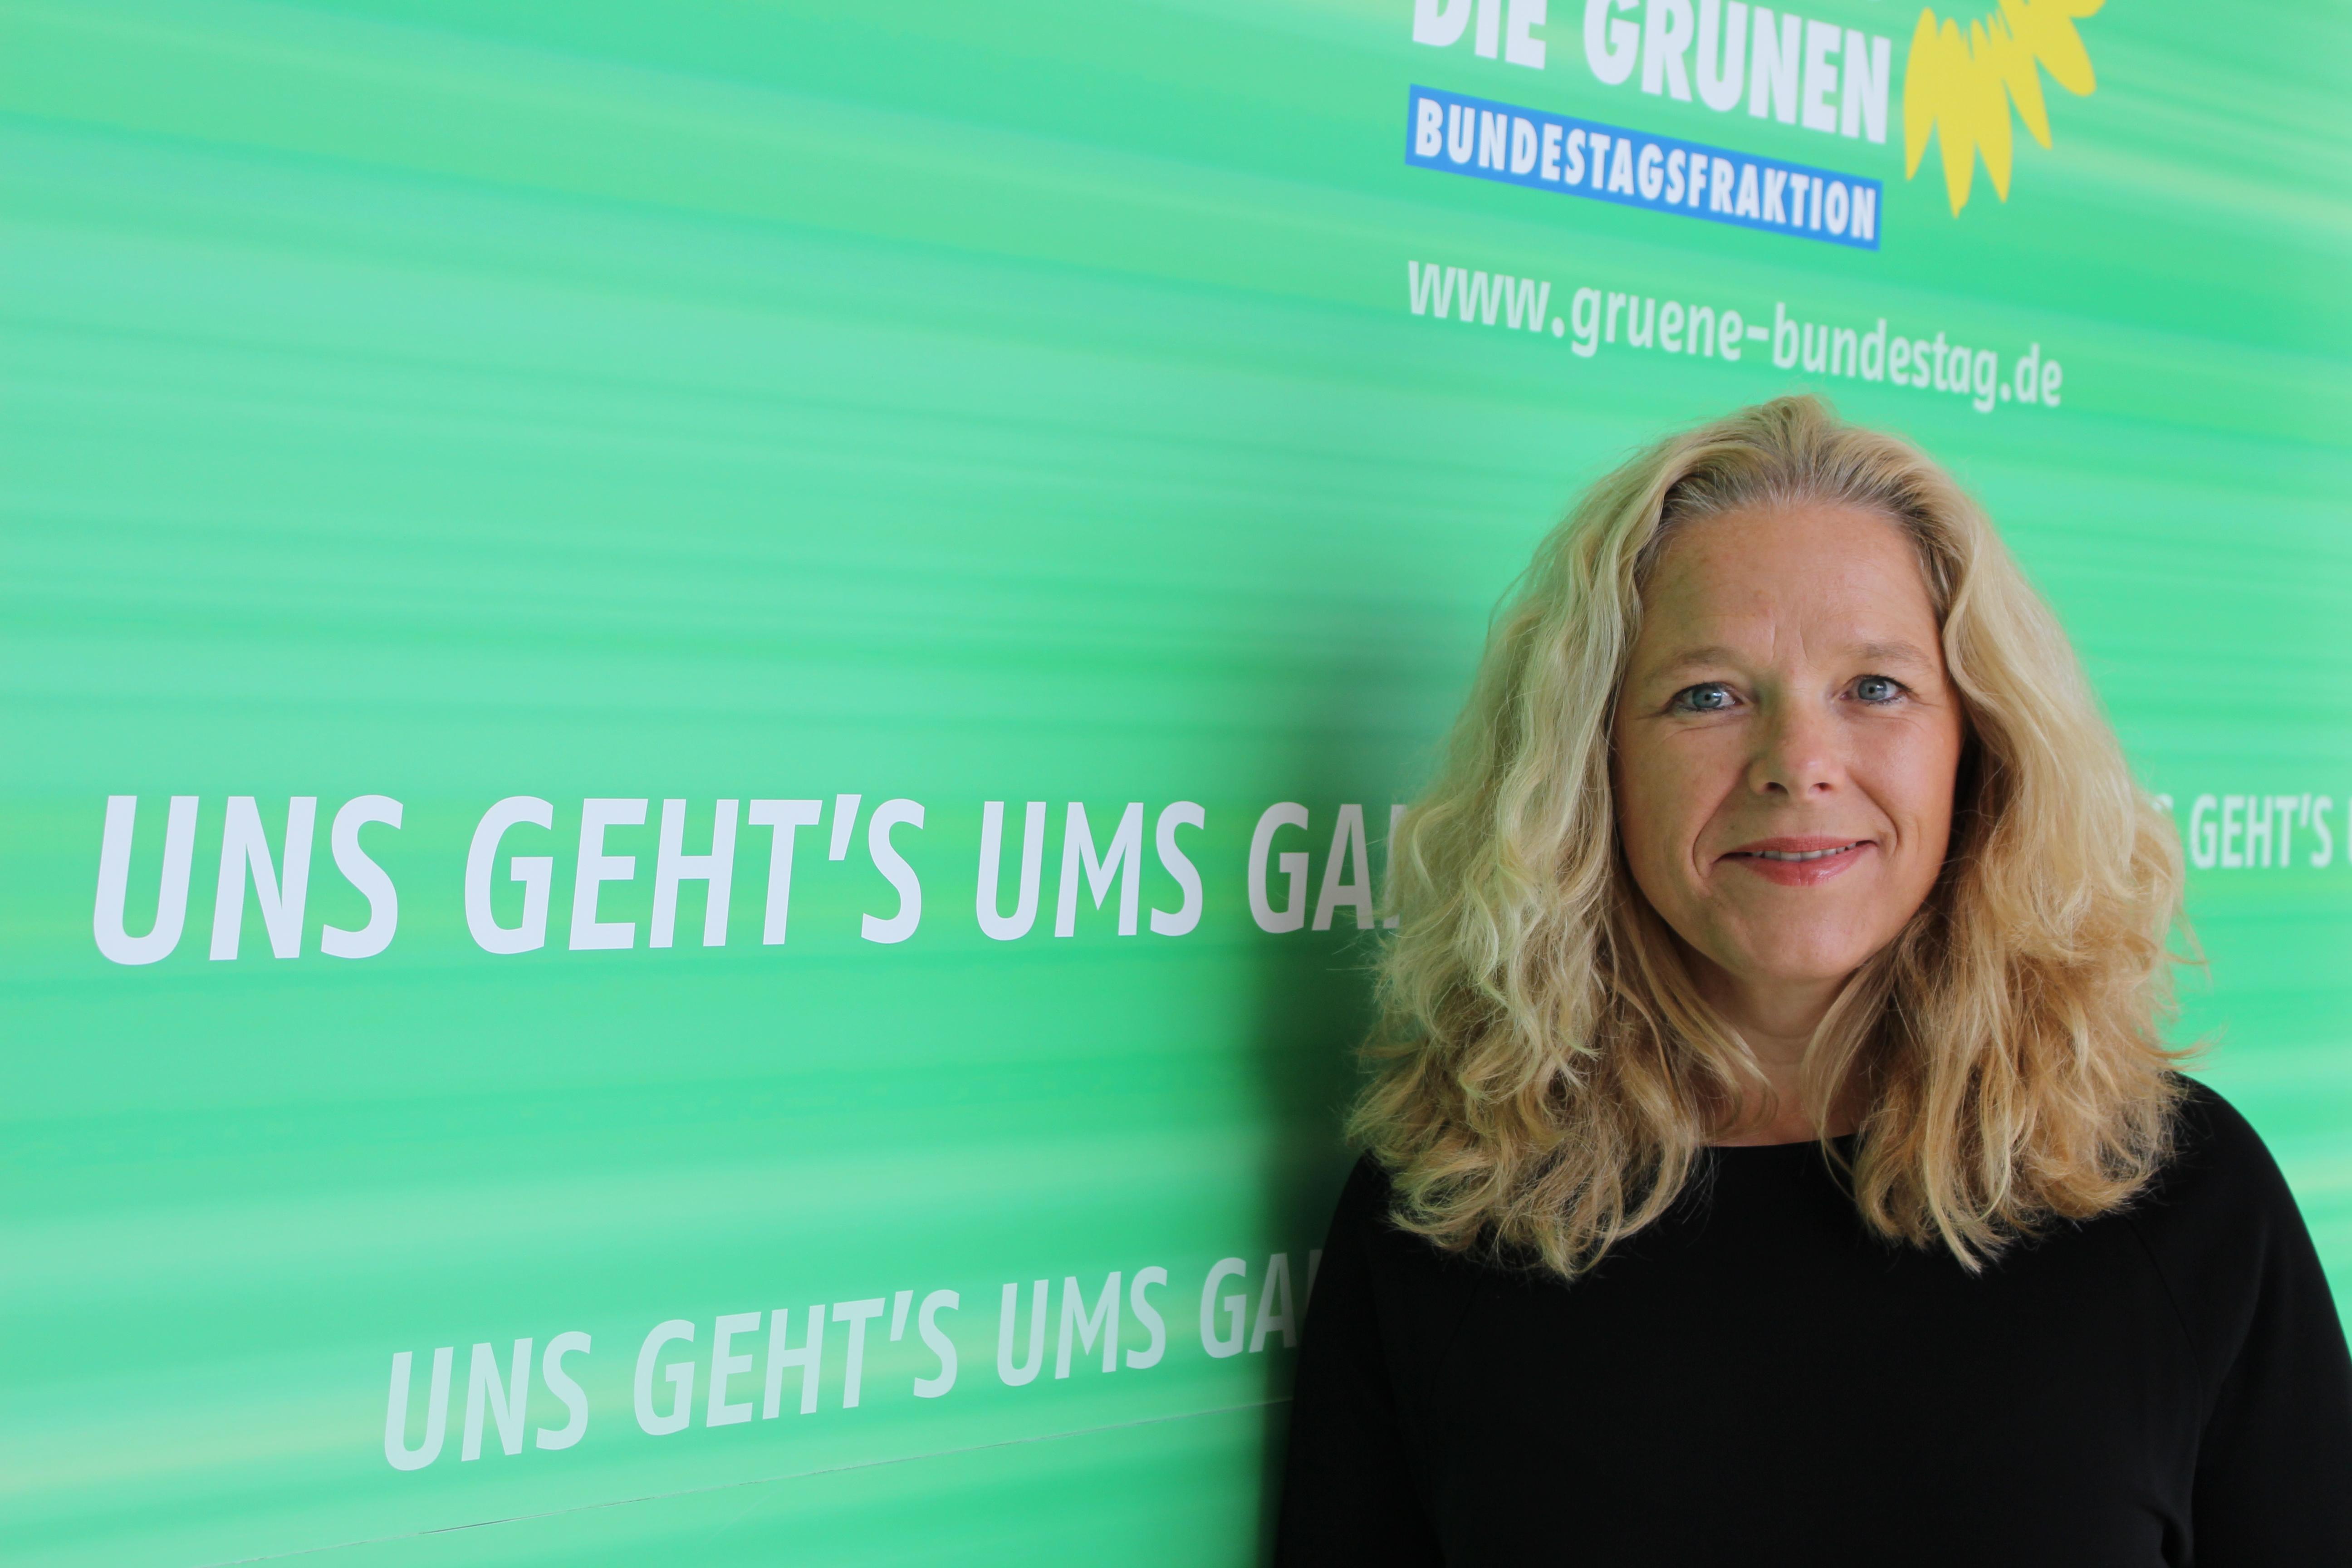 150911 PM Minderheitenrechte Familienausschuss Bundestag Doris Wagner Anhoerung